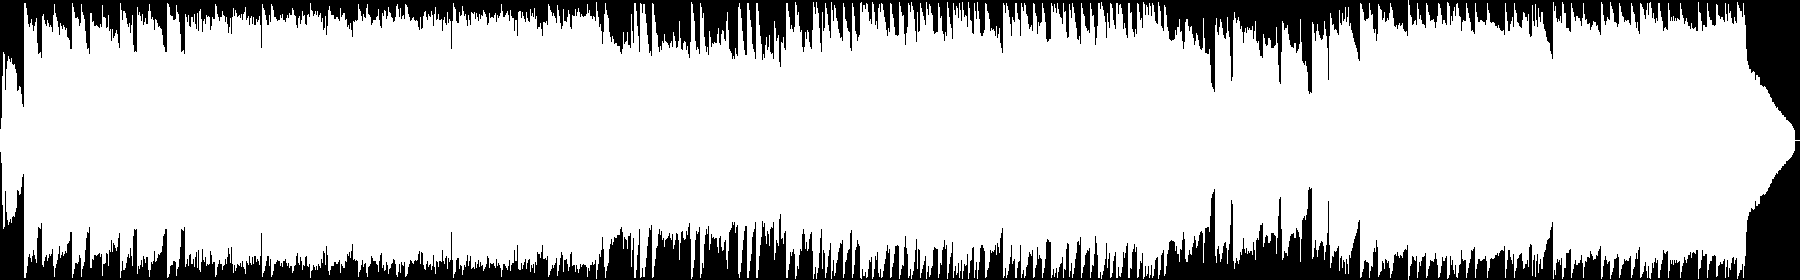 Pop Midi Chords audio waveform